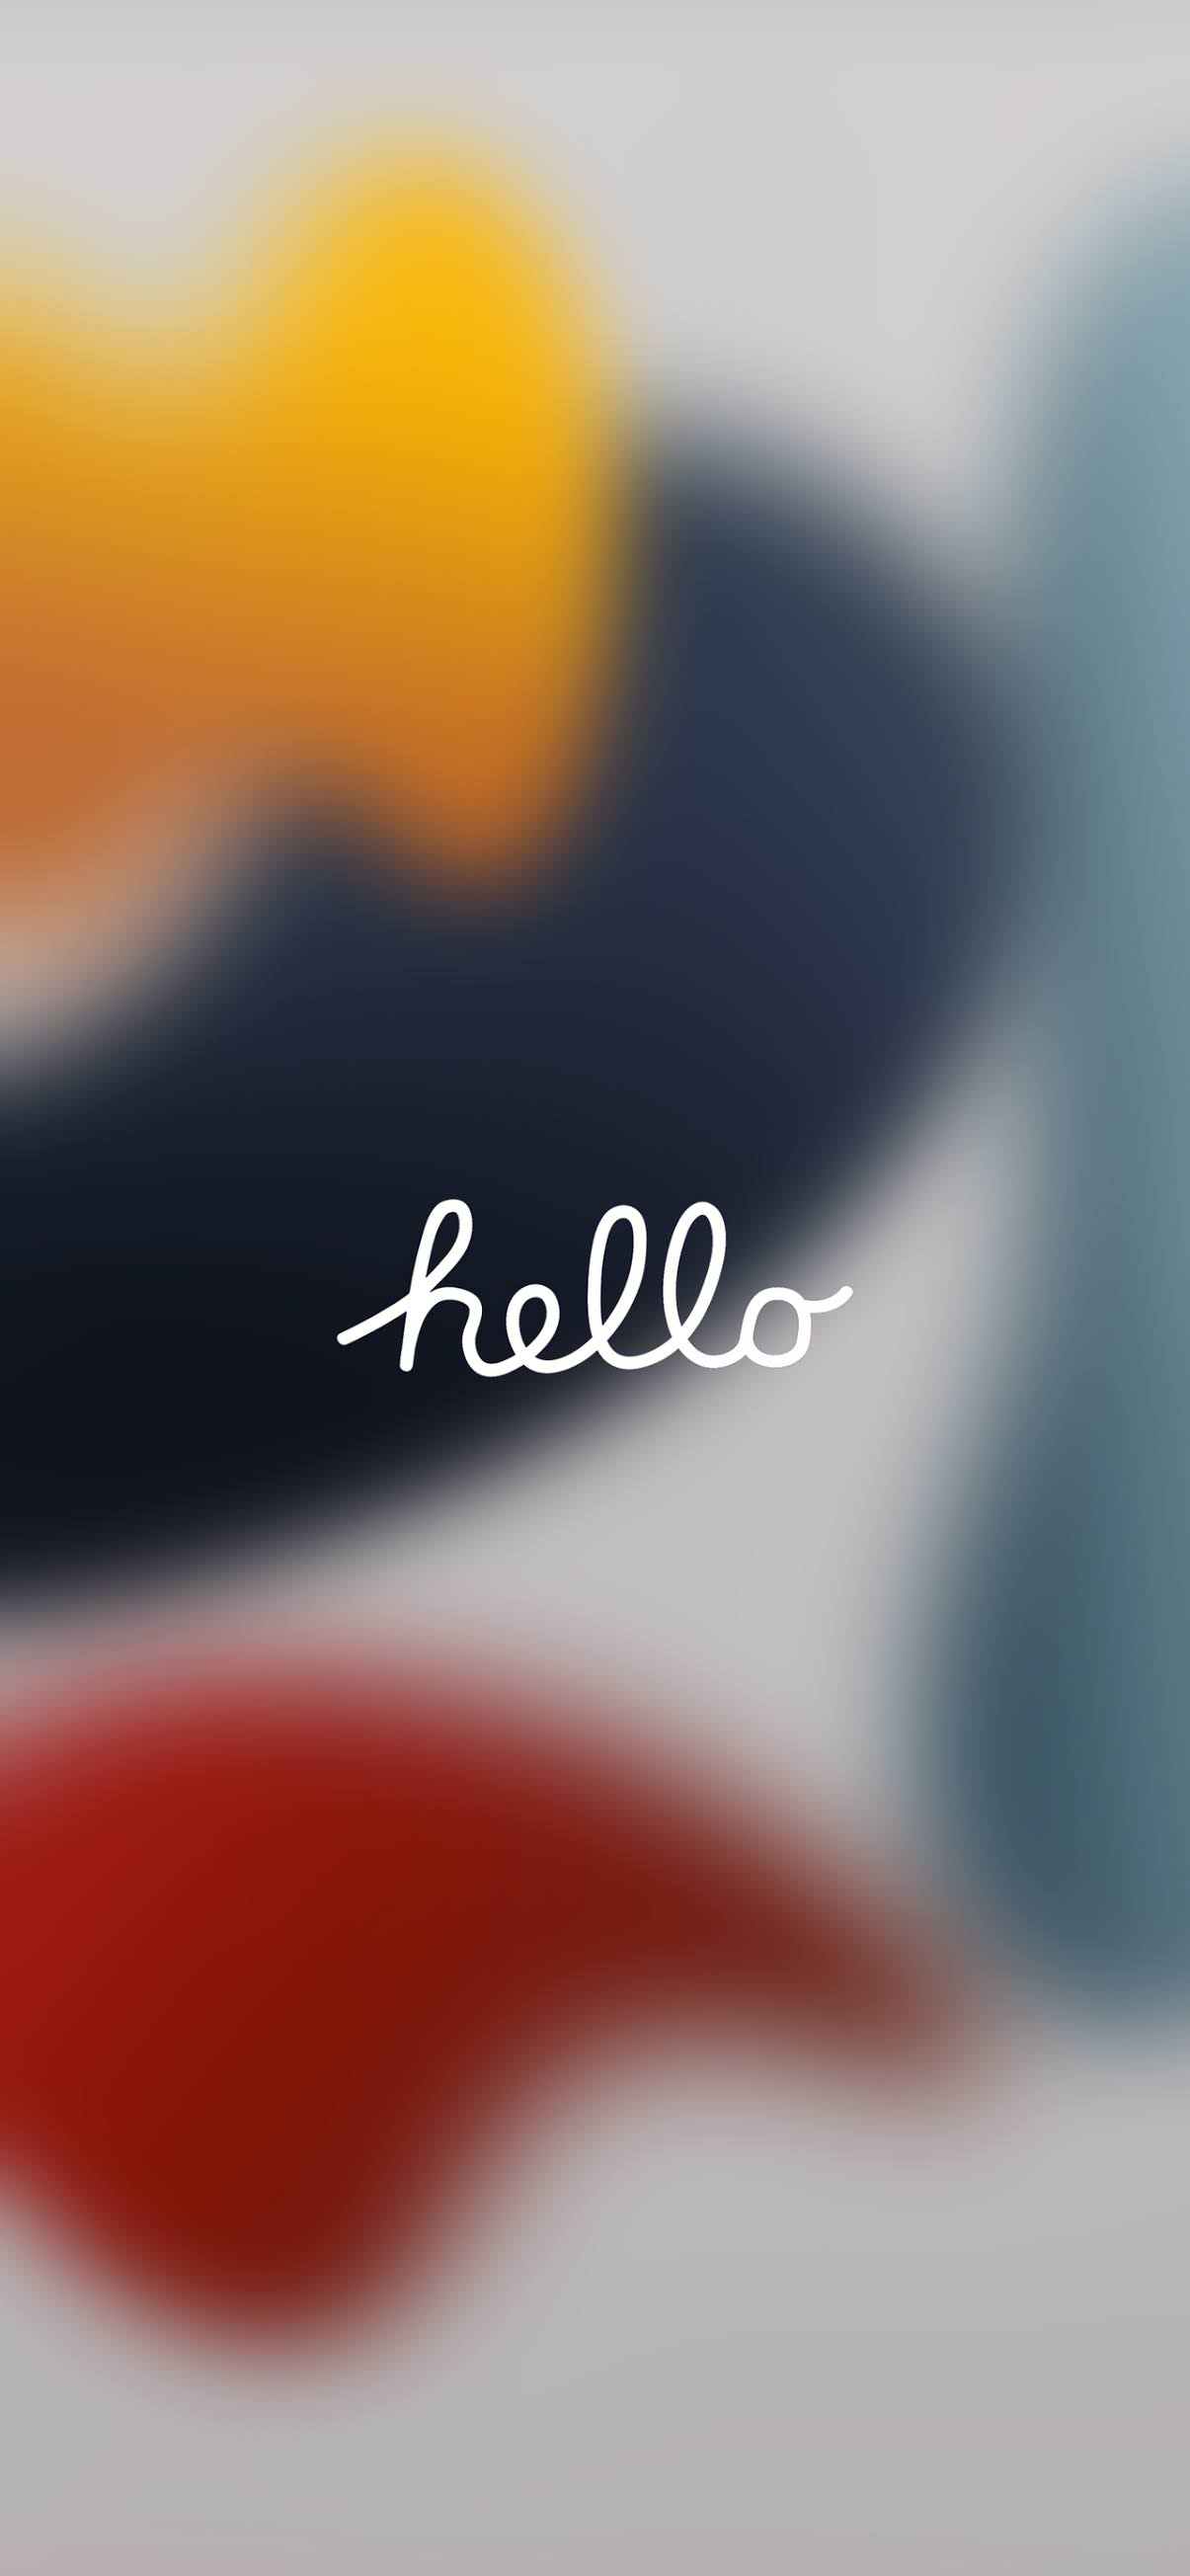 hello phone wallpaper